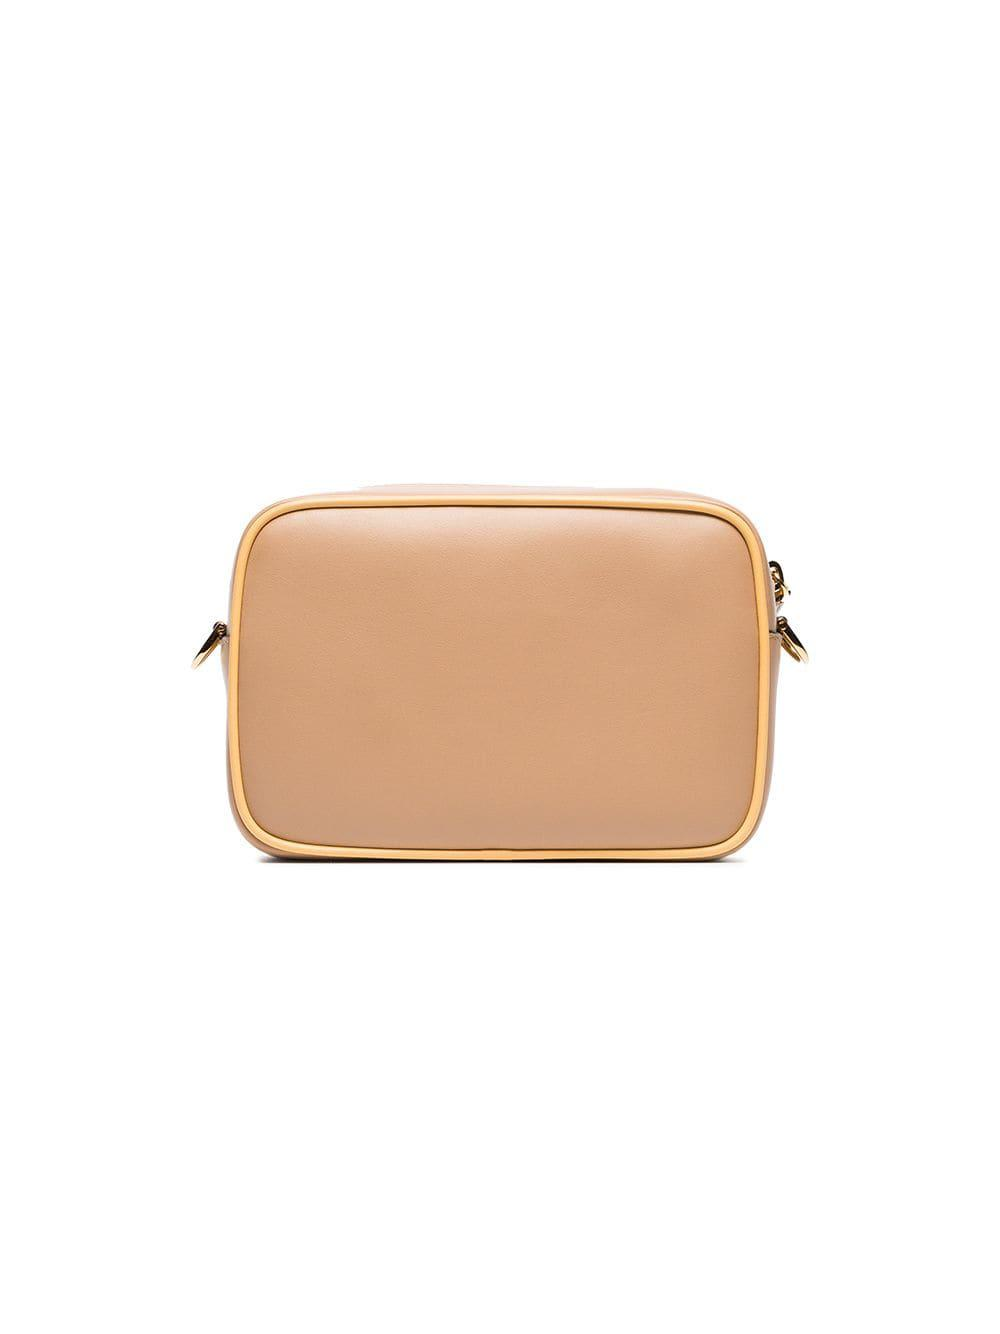 dec908034225 Fendi - Multicolor Nude Mini Camera Leather Cross-body Bag - Lyst. View  fullscreen